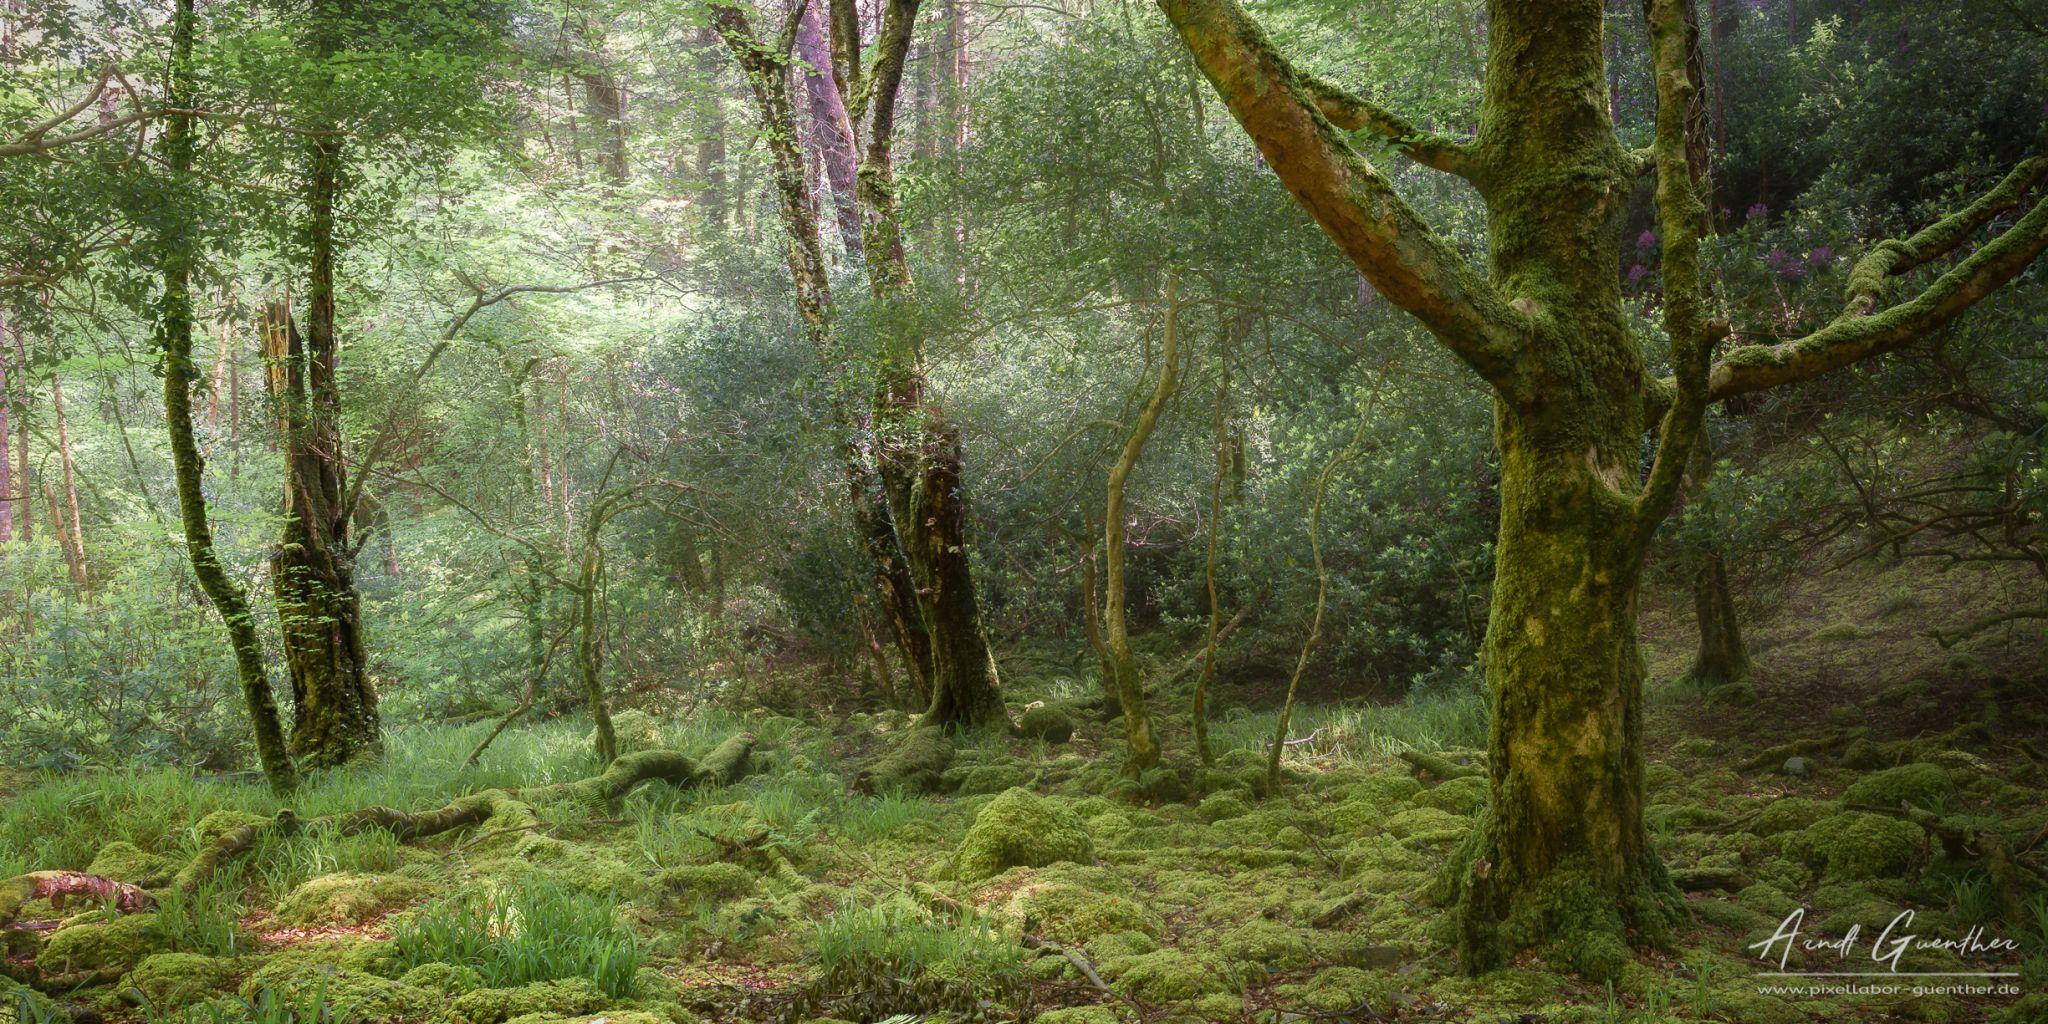 Torc Waterfall Forrest, Ireland